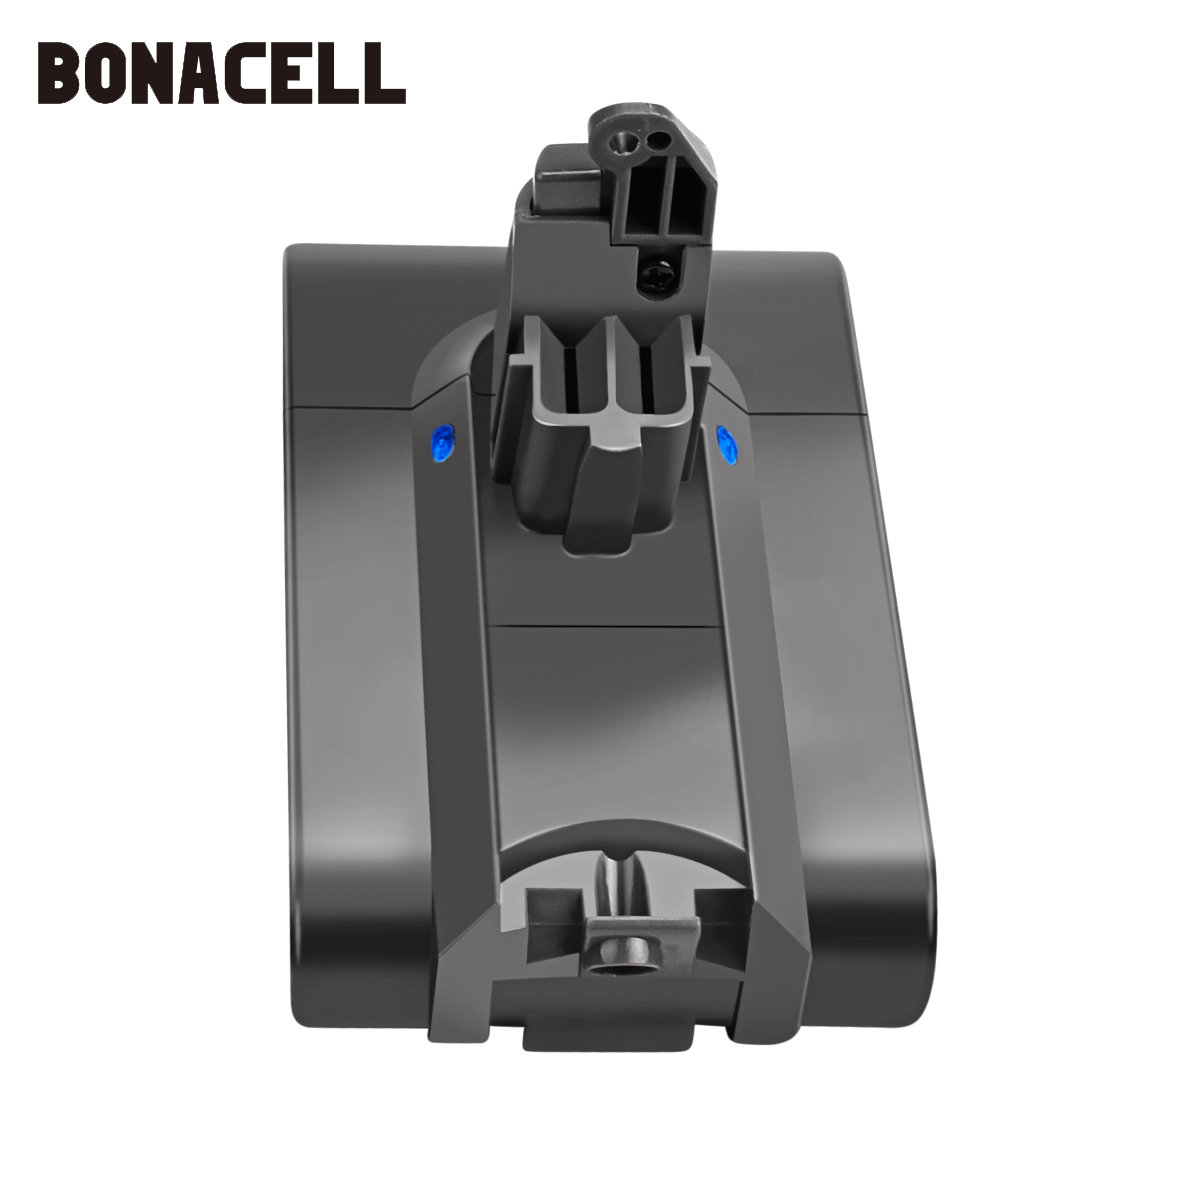 bonacell 3000mAh 21 6V Li ion Battery for Dyson V6 DC58 DC59 DC61 DC62 DC74 SV07 SV03 SV09 965874 02 Vacuum Cleaner Battery L30 in Replacement Batteries from Consumer Electronics